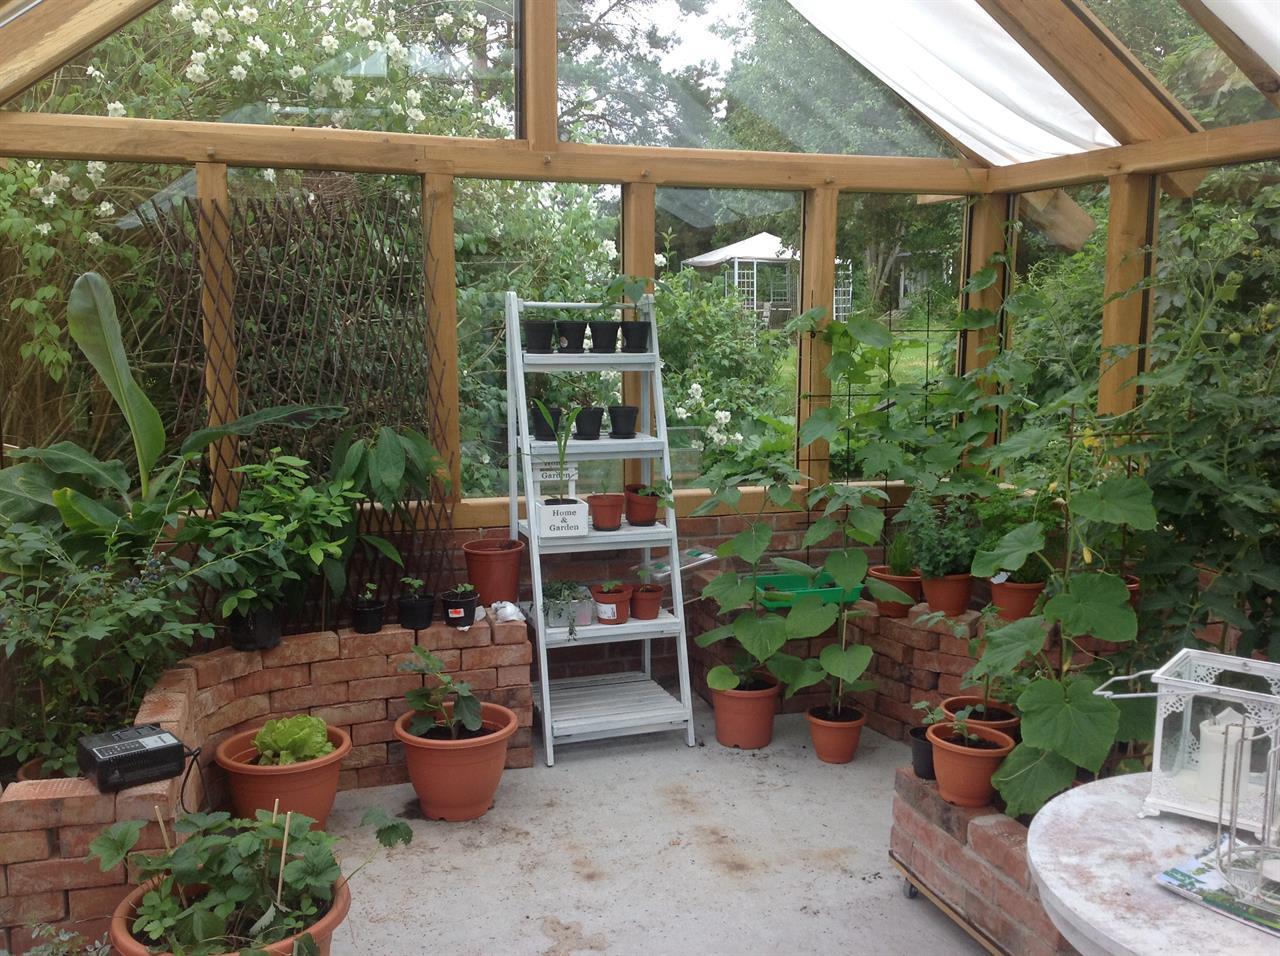 Ekstomme o tegel i växthus